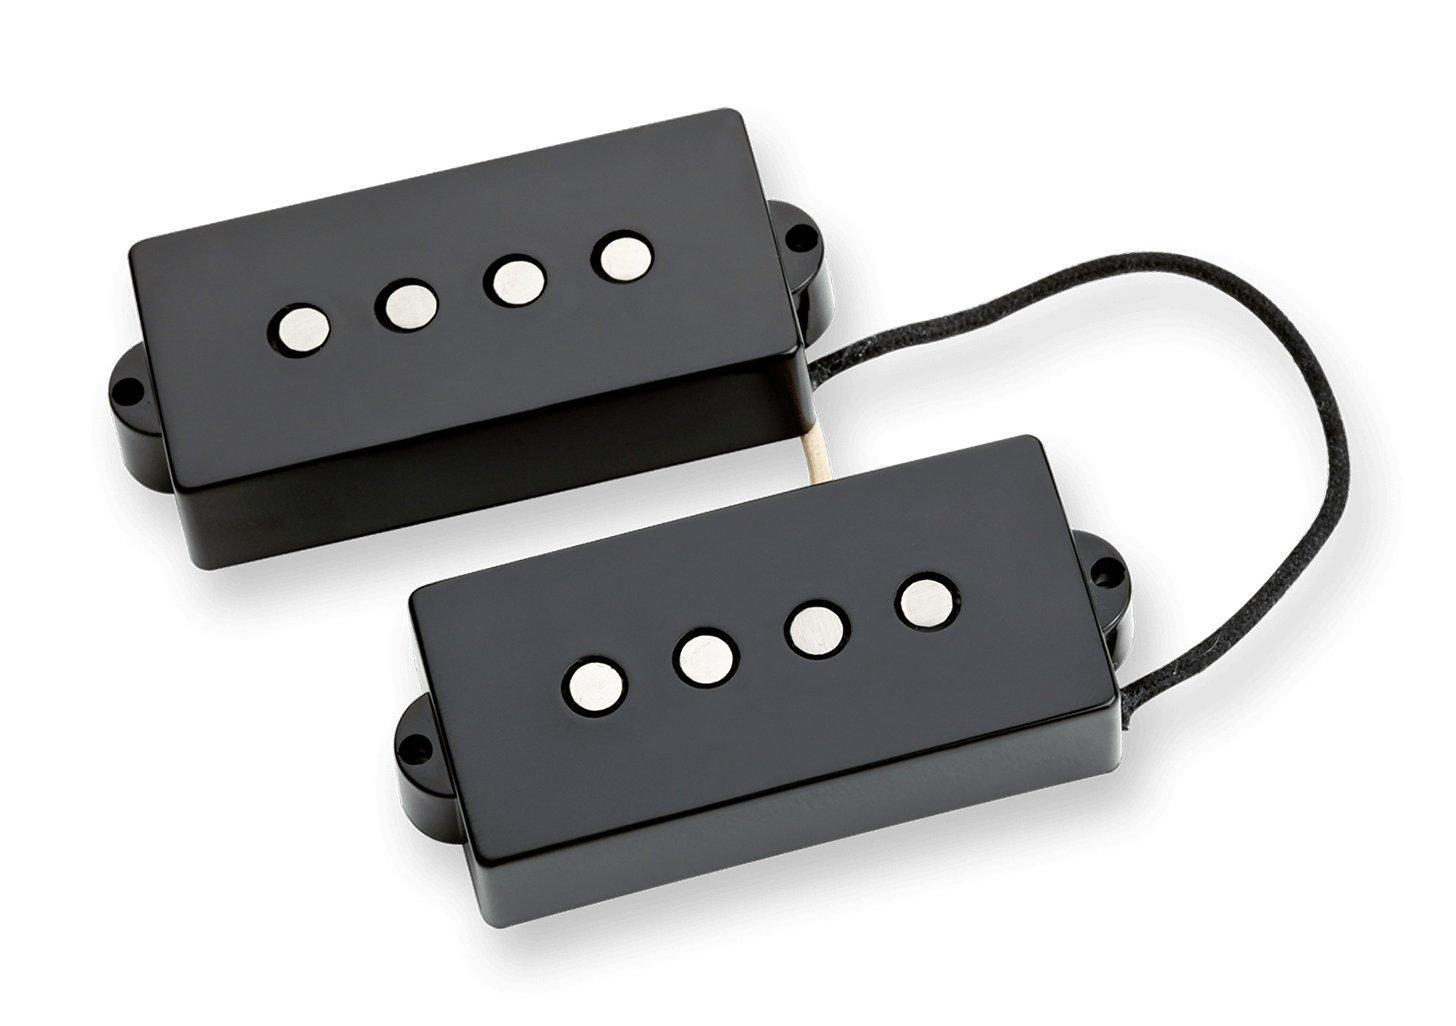 Seymour Duncan Spb 1 Vintage P Bass Split Coil Pickup 1978 Fender Precision Wiring Diagram Black Musical Instruments